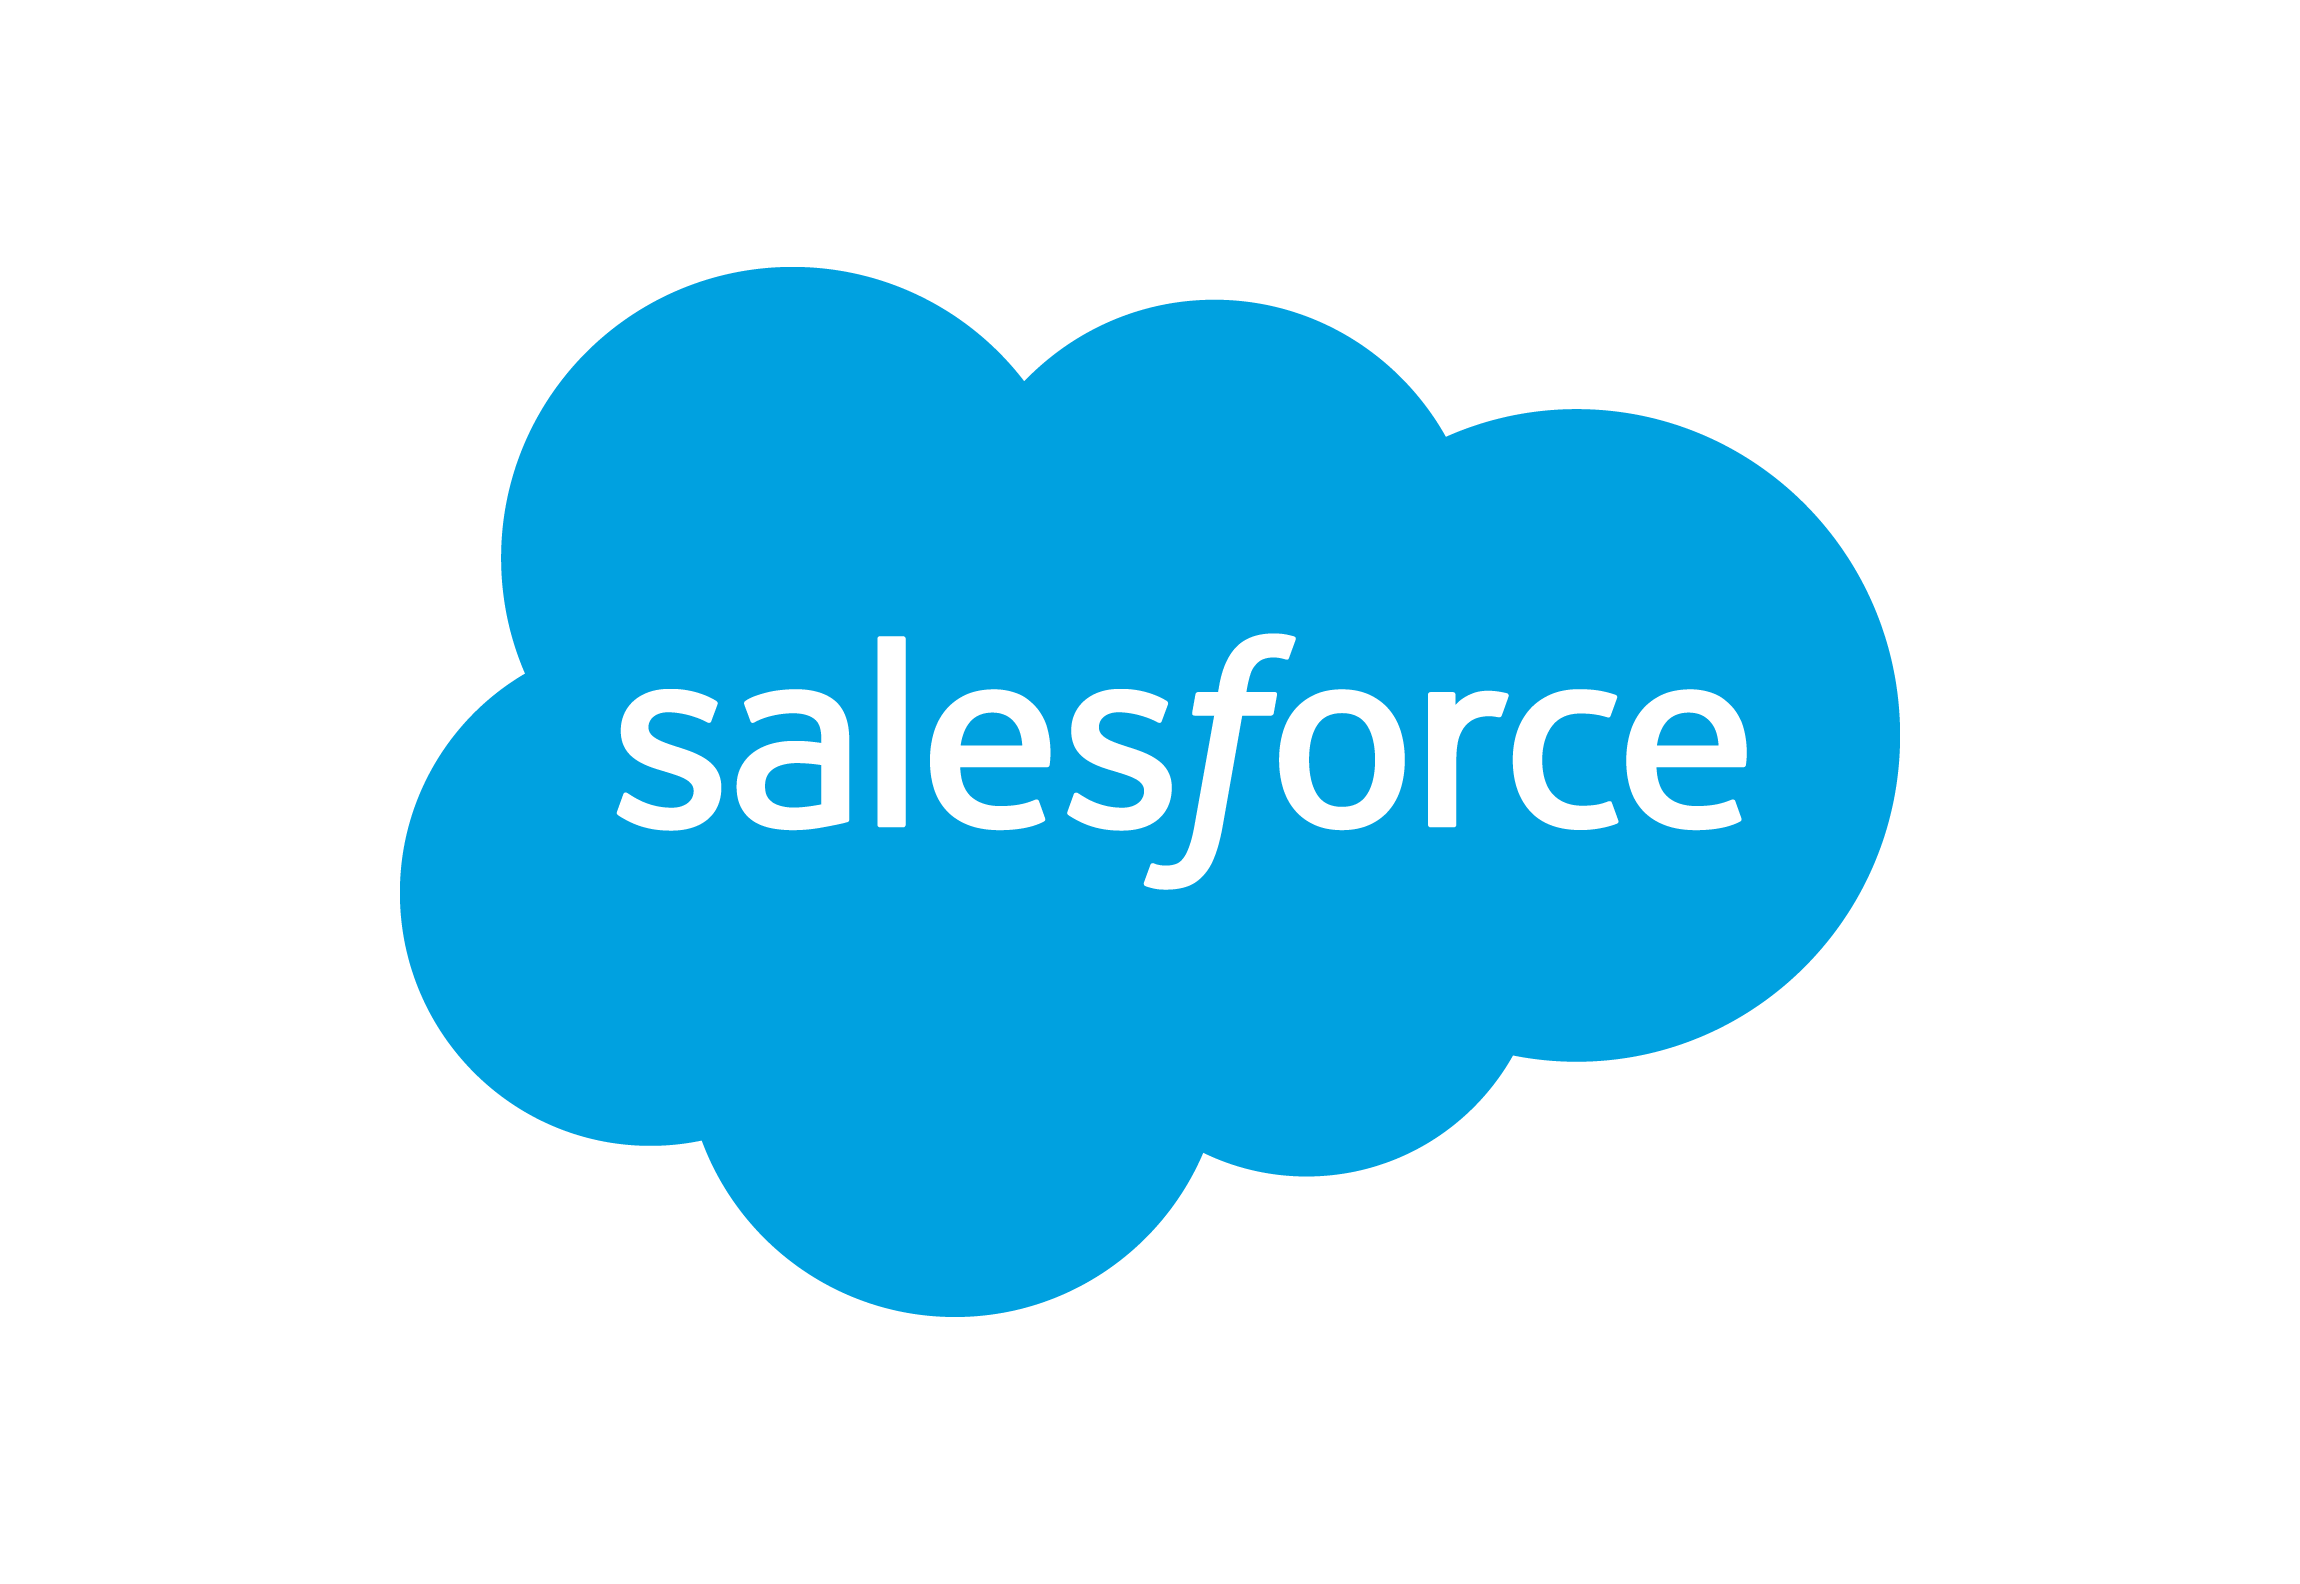 3salesforce-logo-vector-png-salesforce-logo-png-2300